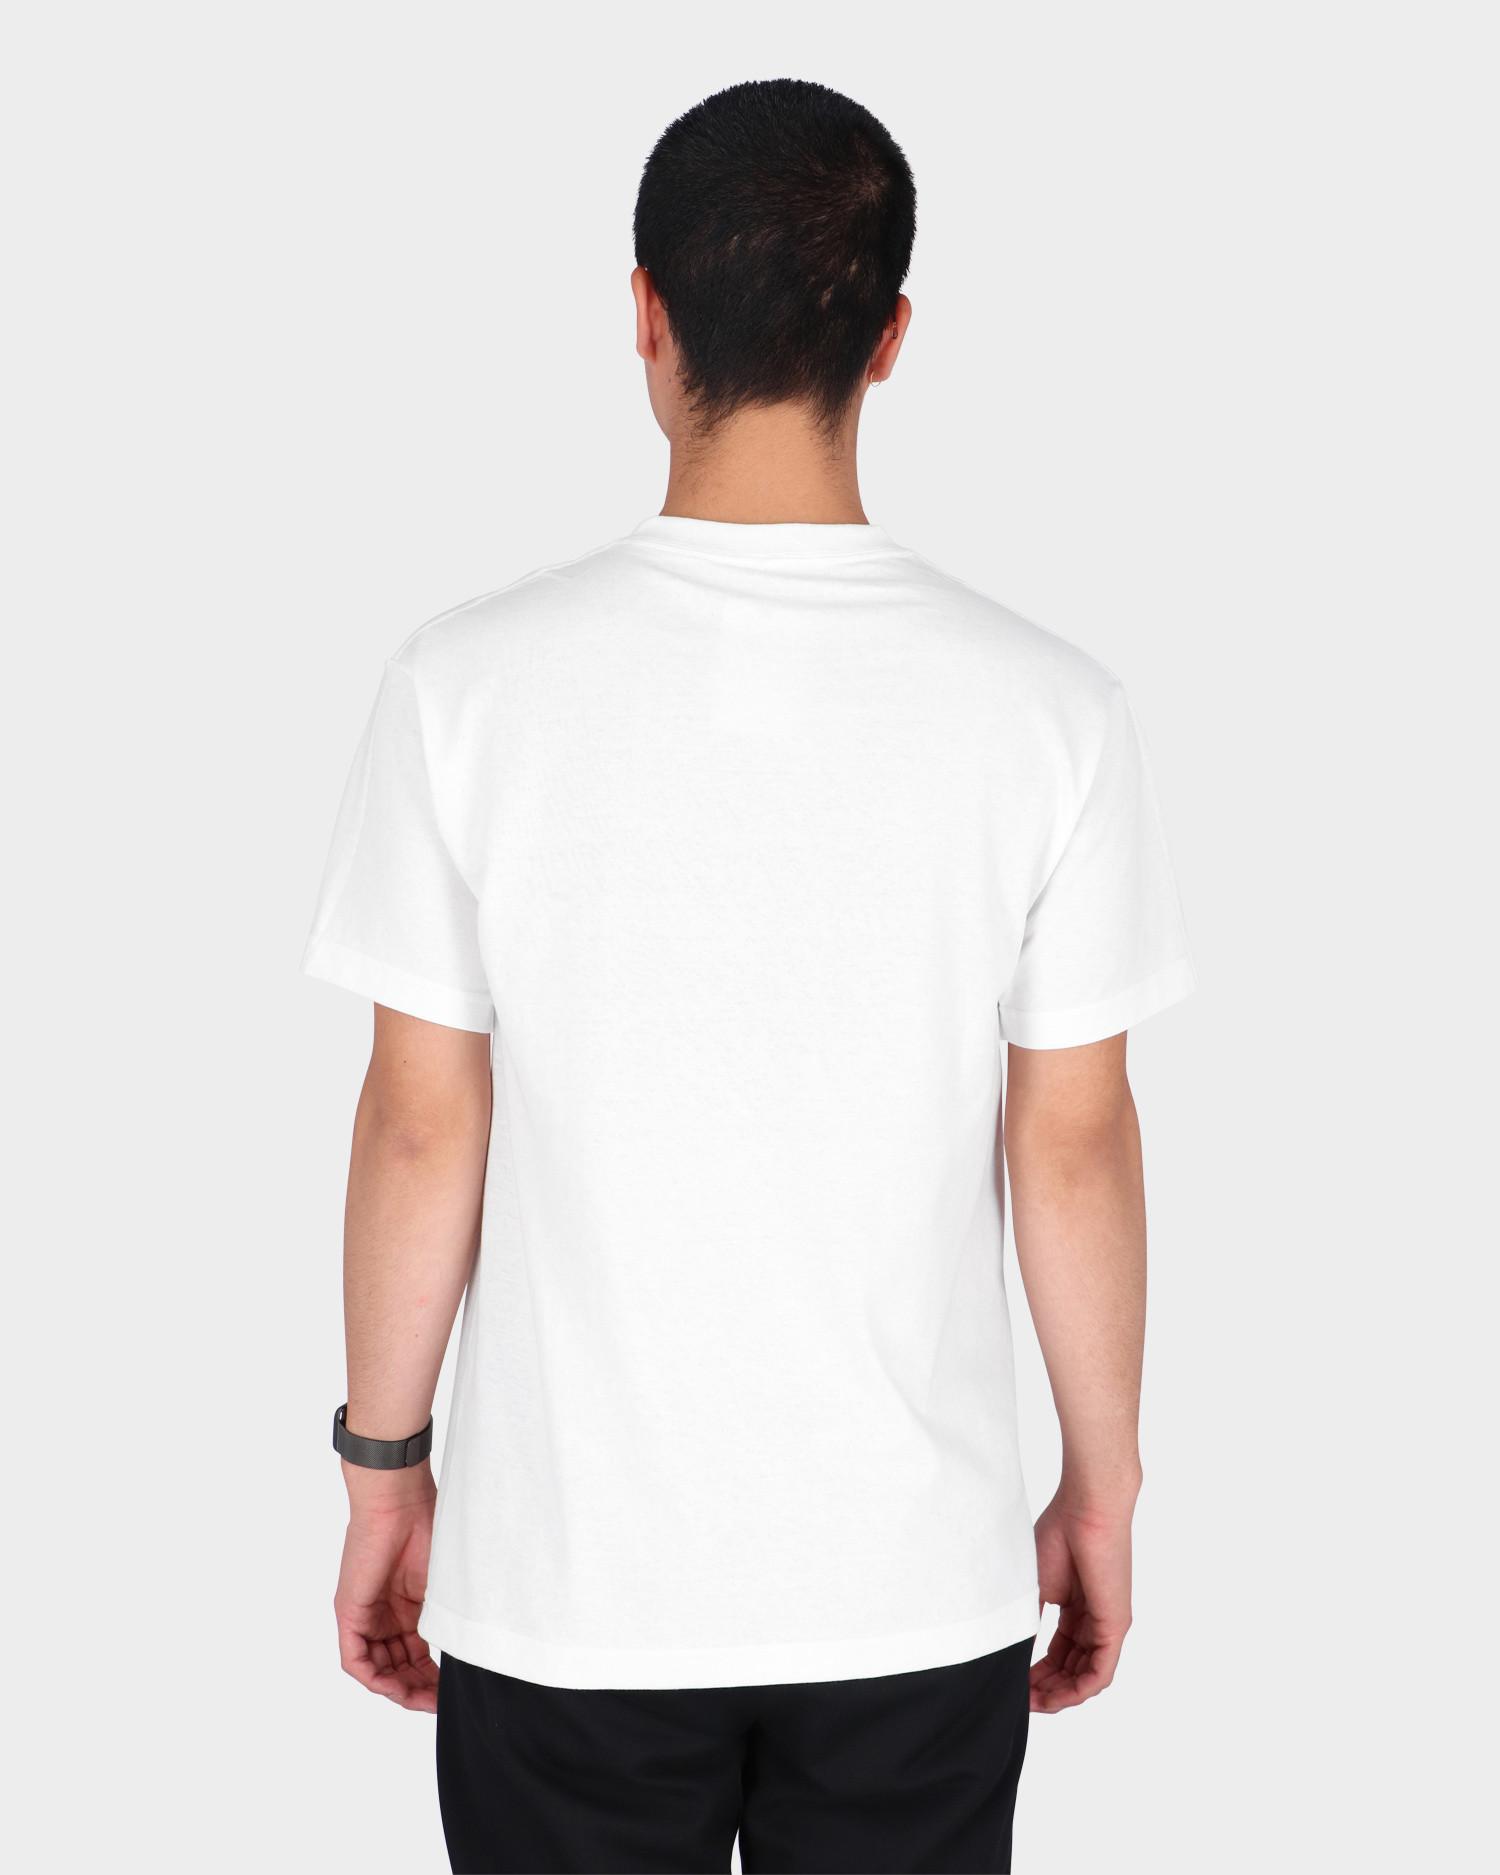 Quasi Skateboards Mr. Hand Crme T-Shirt White